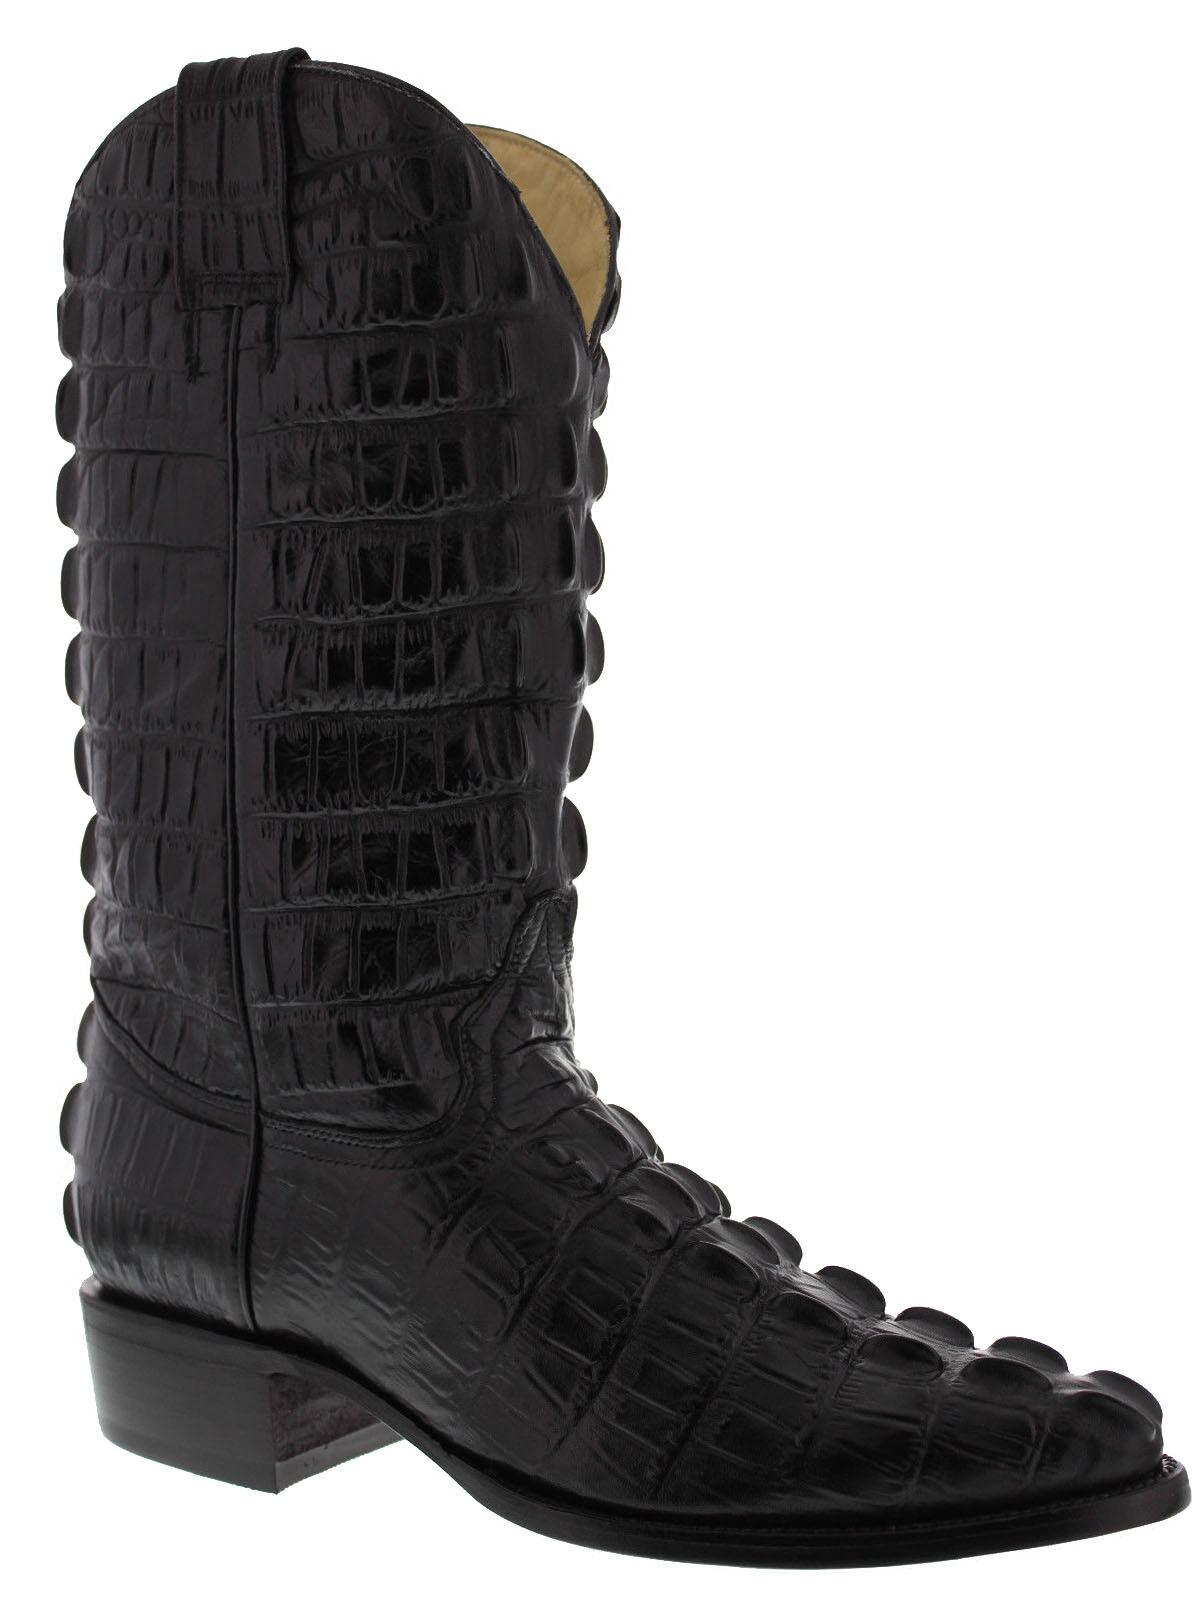 Mens Black Full Crocodile Western Leather Cowboy Boots Tail Cut Pattern J Toe